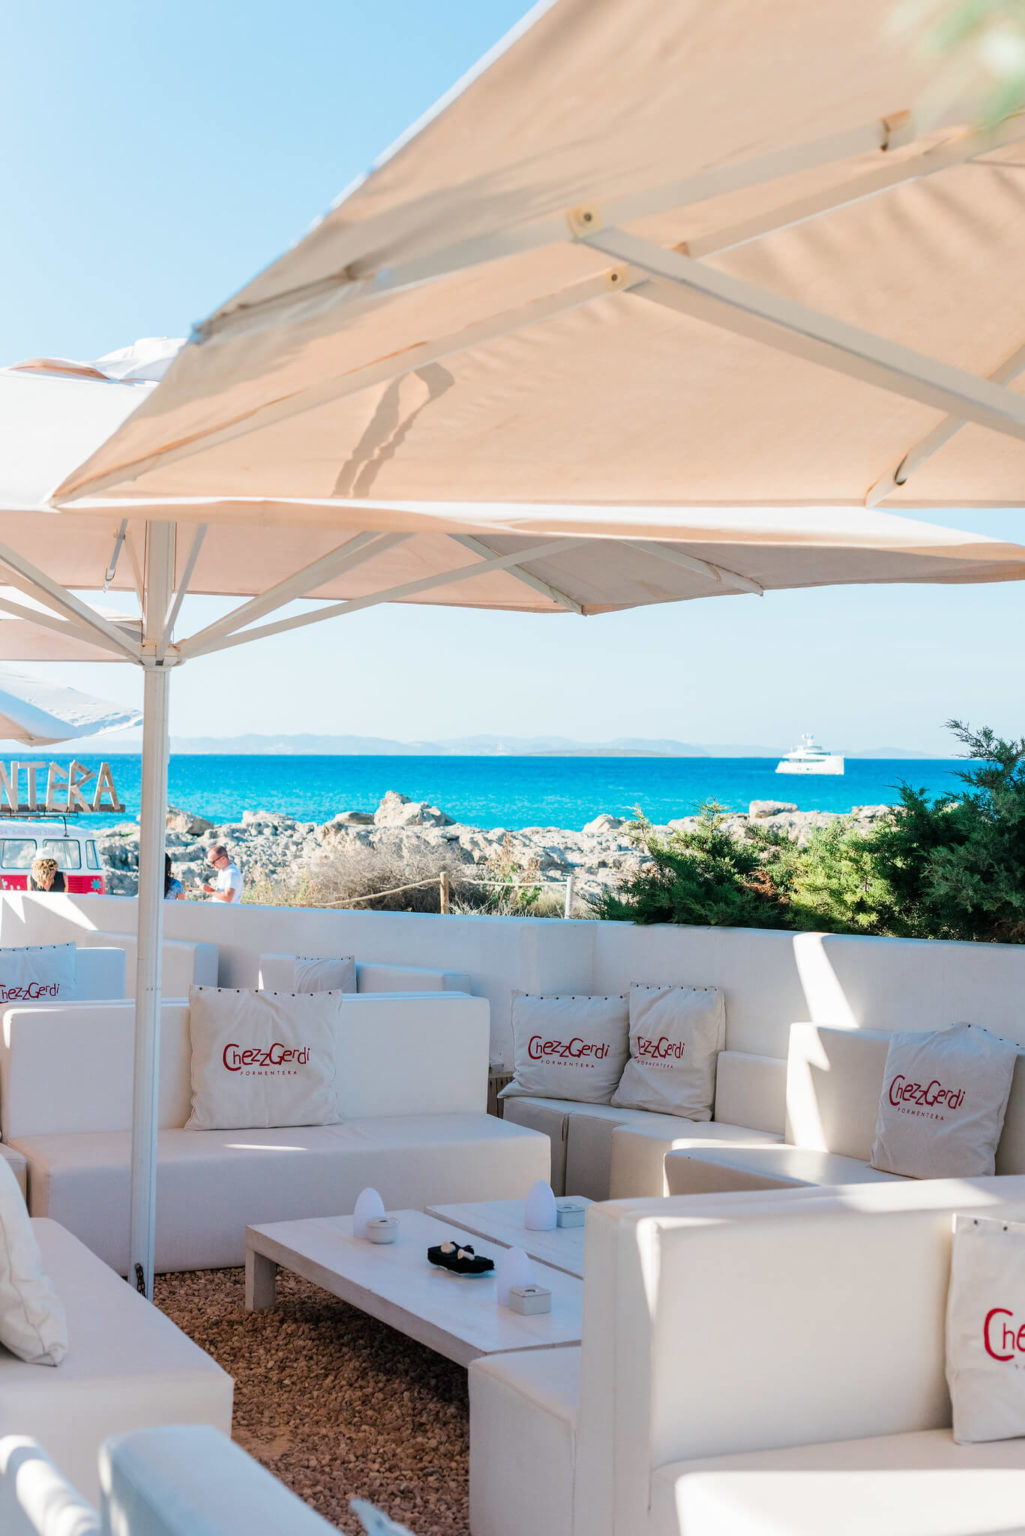 https://www.white-ibiza.com/wp-content/uploads/2020/03/formentera-beach-restaurants-chezz-gerdi-2020-05-1025x1536.jpg